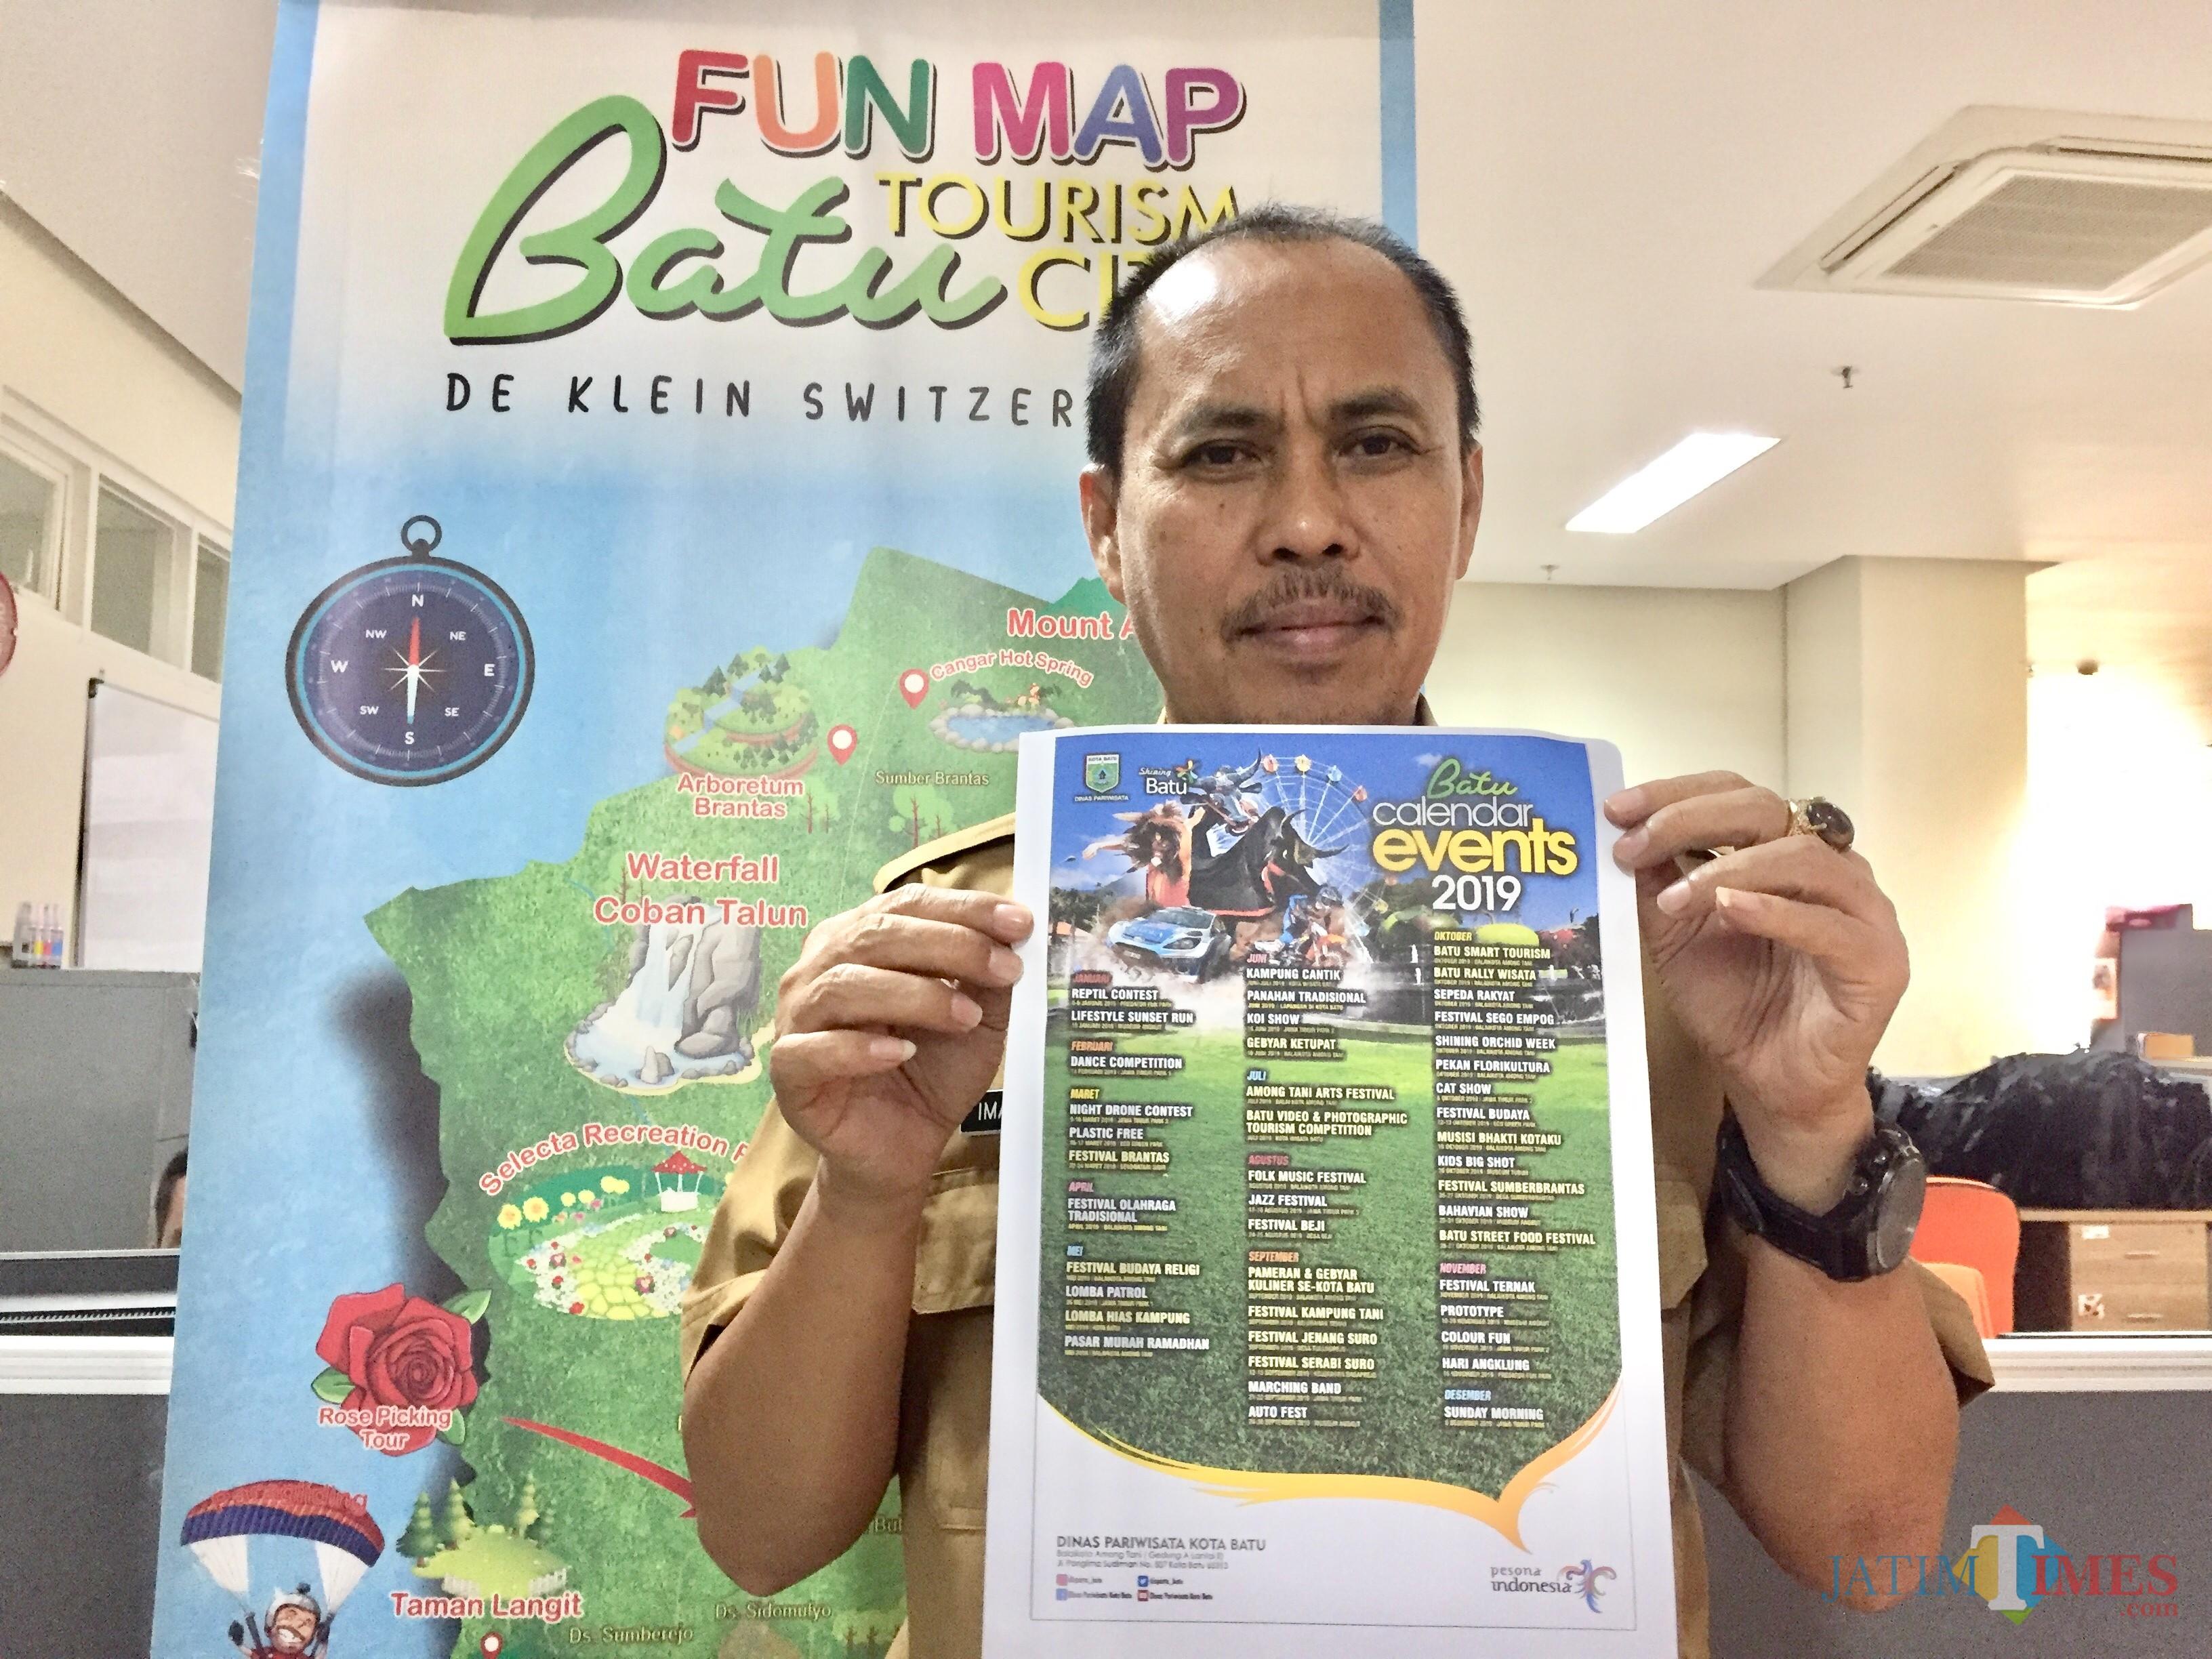 Plt Kepala Dinas Pariwisata Kota Batu Imam Suryono saat menunjukkan kalender event di Kantornya Balai Kota Among Tani. (Foto: Irsya Richa/MalangTIMES)